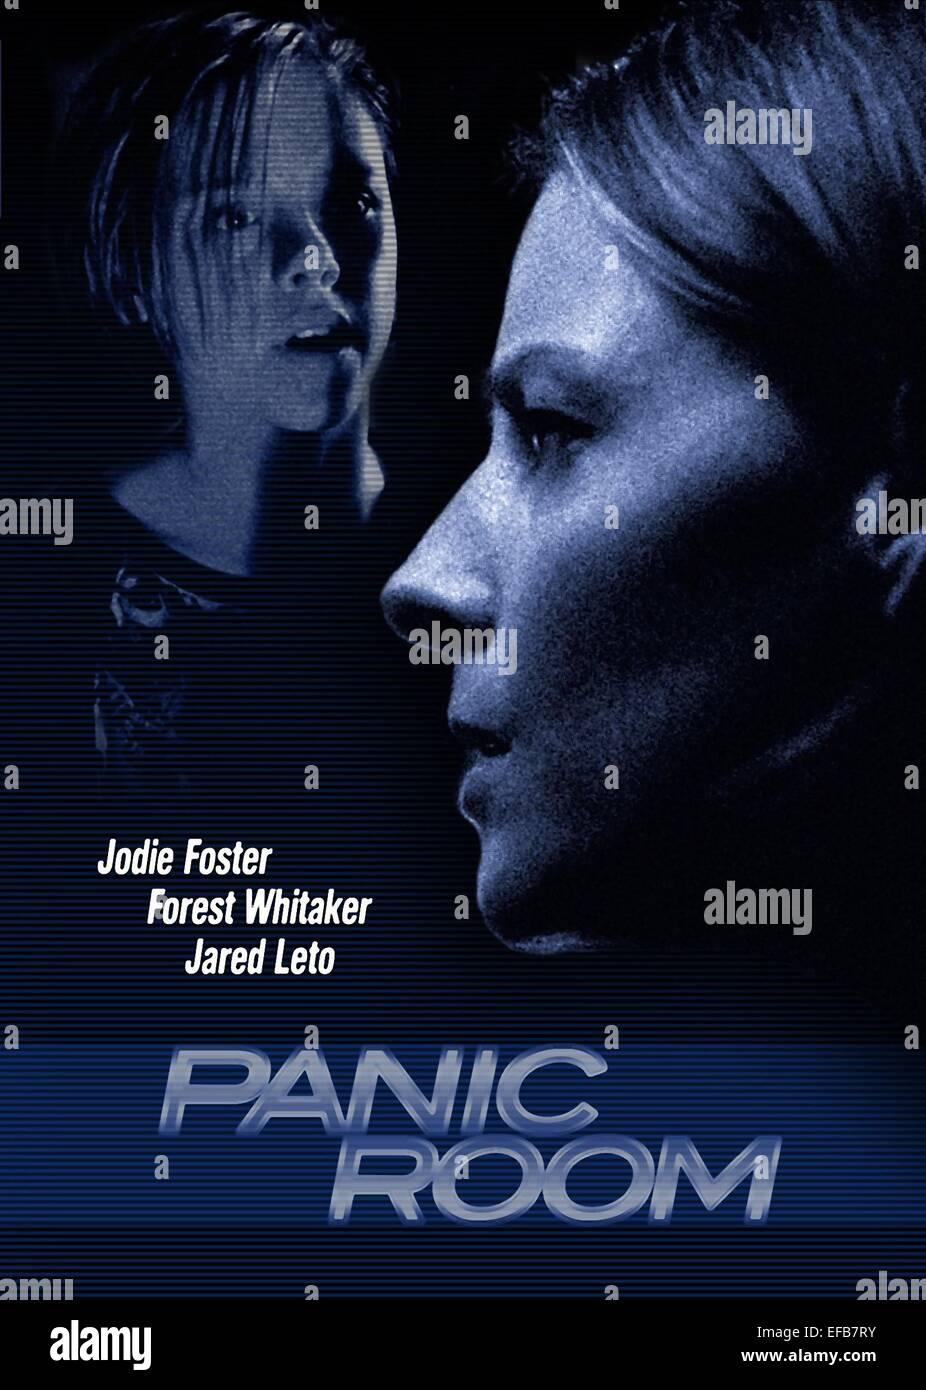 Kristen Stewart Jodie Foster Poster Panic Room 2002 Stock Photo Alamy